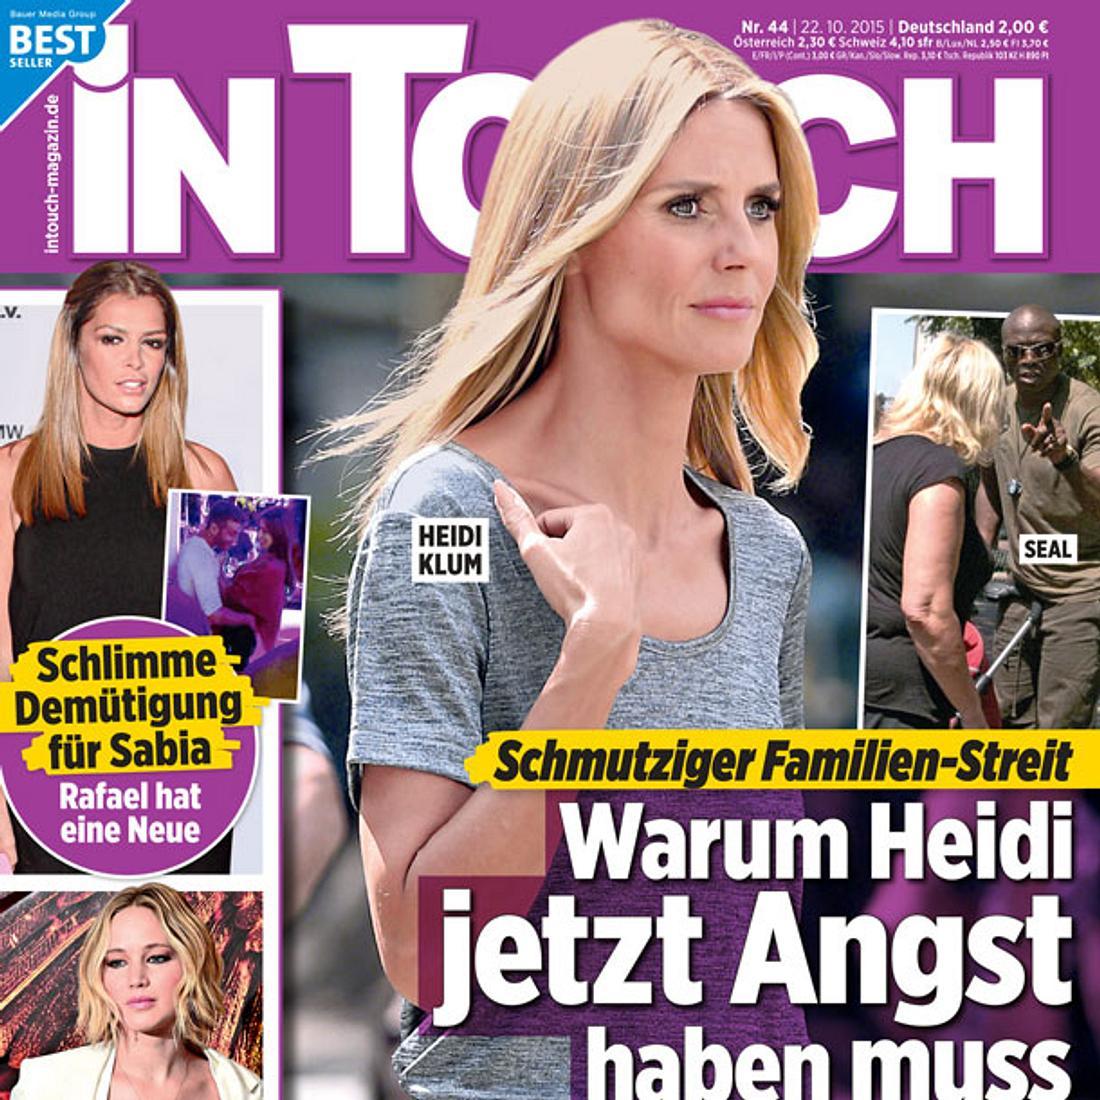 InTouch: Schmutziger Familien-Streit bei Heidi Klum